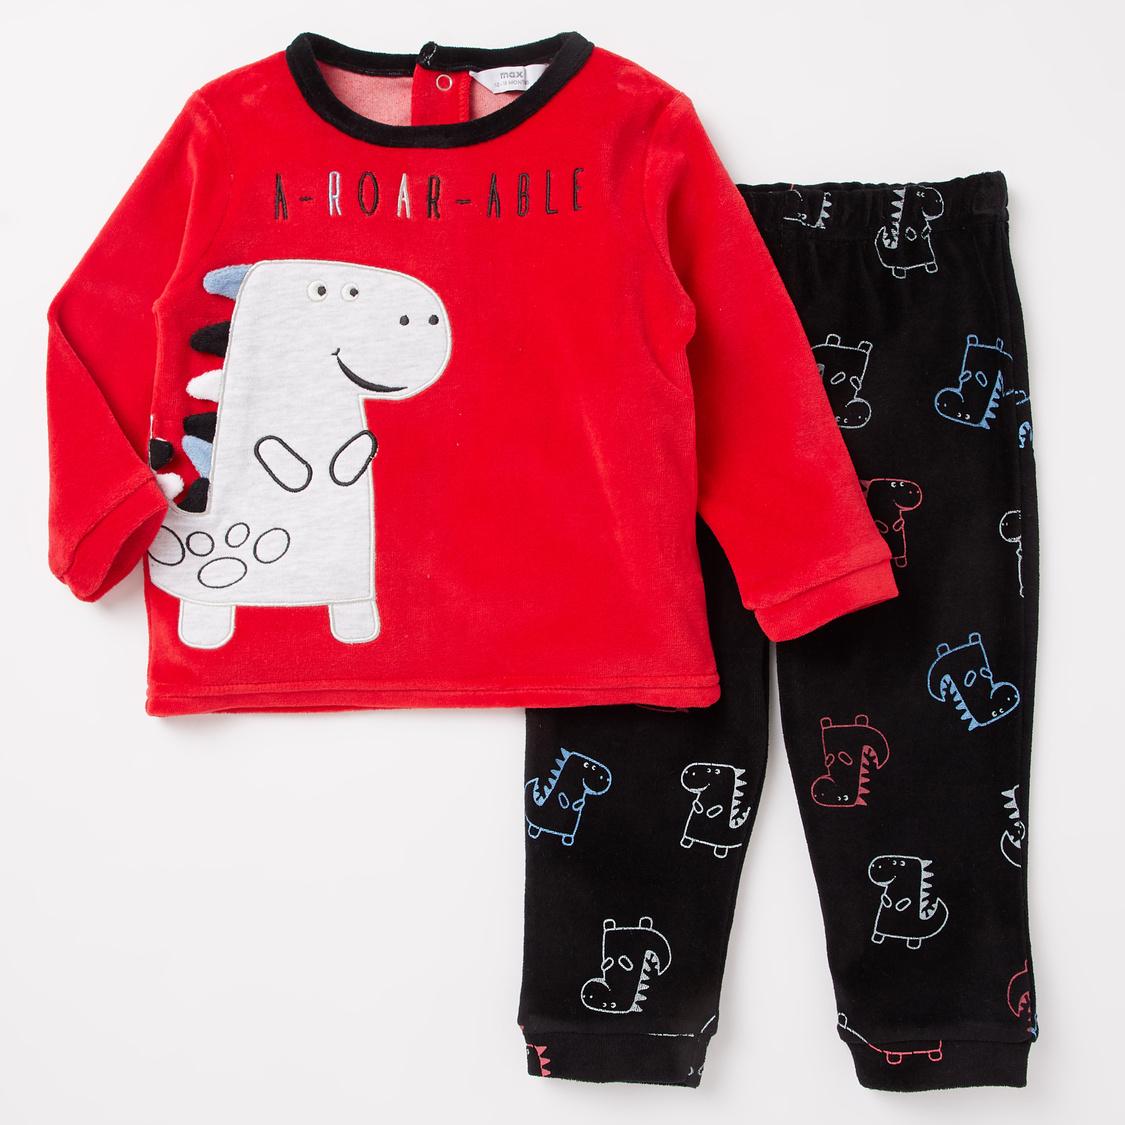 Embroidered Long Sleeves T-shirt and Pyjama Set